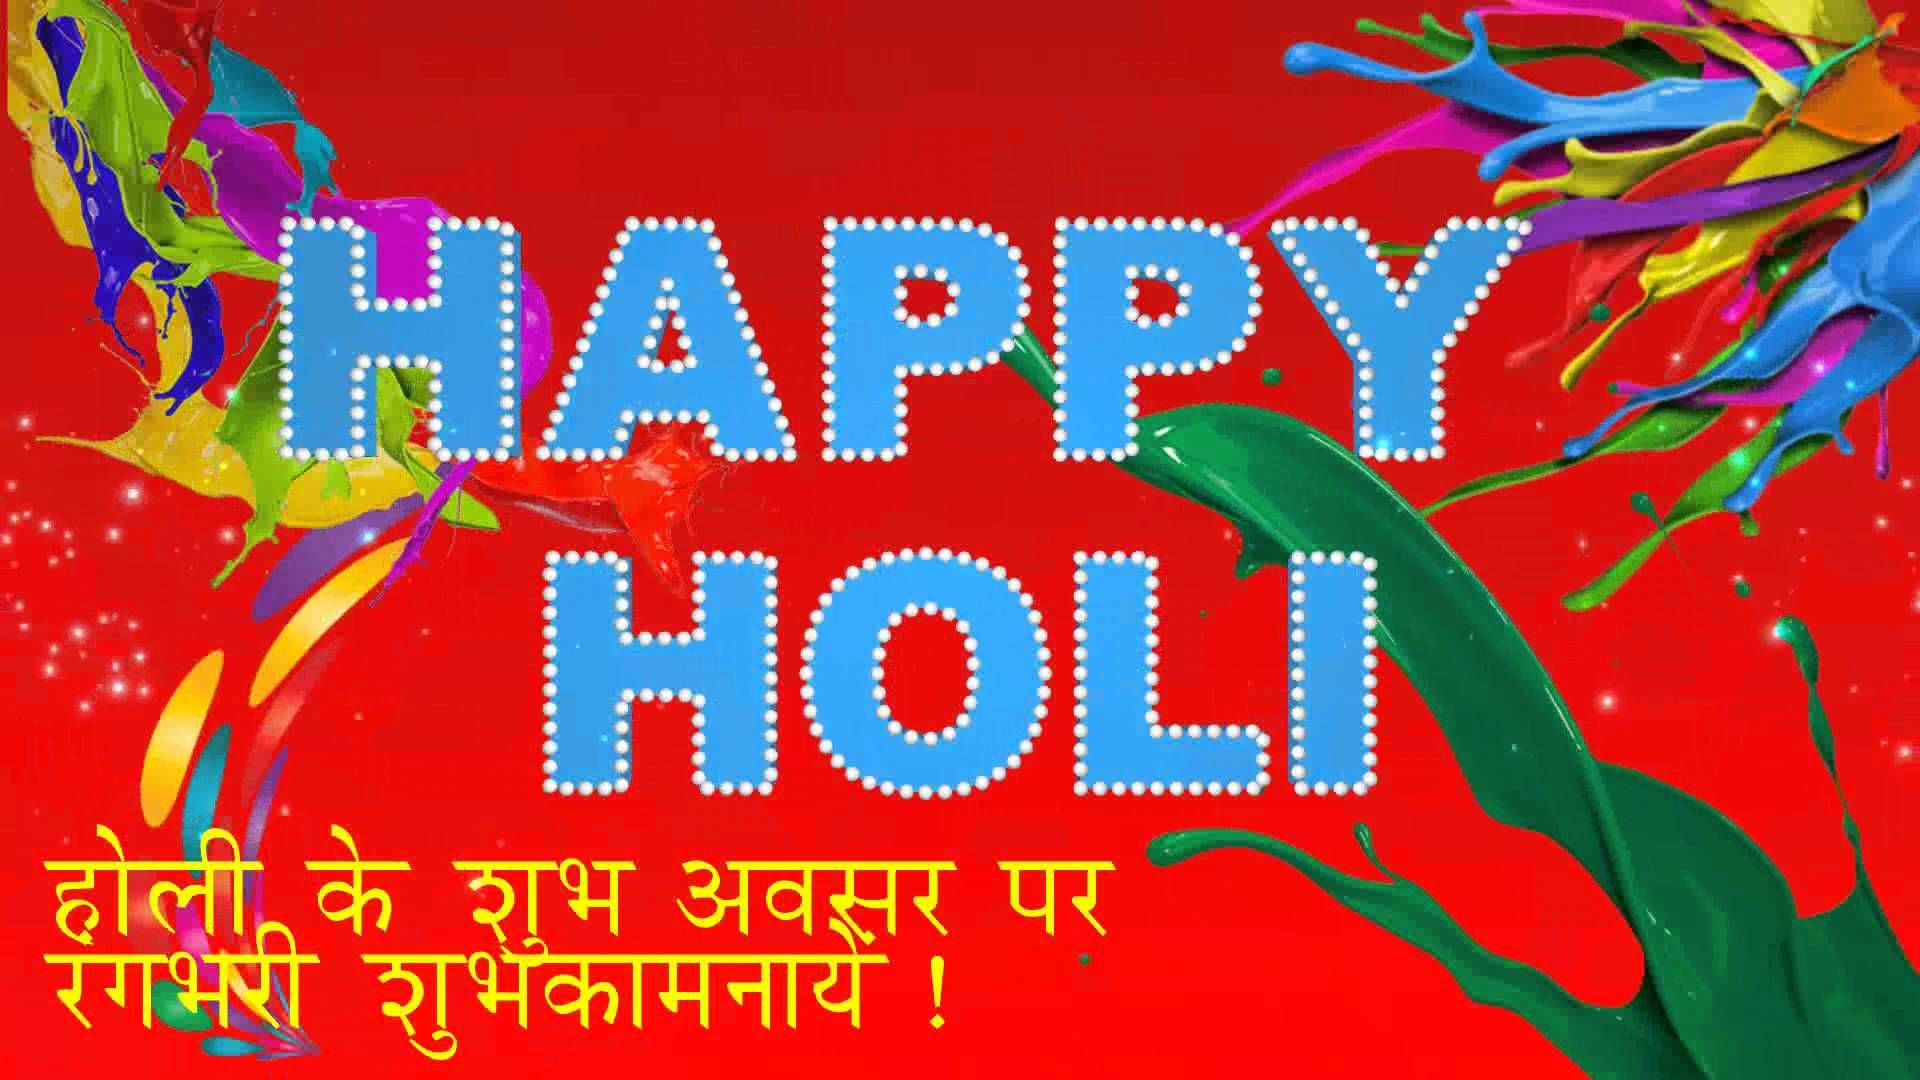 Happy holi 2016 holi whatsapp video holi greetings in hindi holi happy holi 2016 holi whatsapp video holi greetings in hindi holi wishes kristyandbryce Image collections